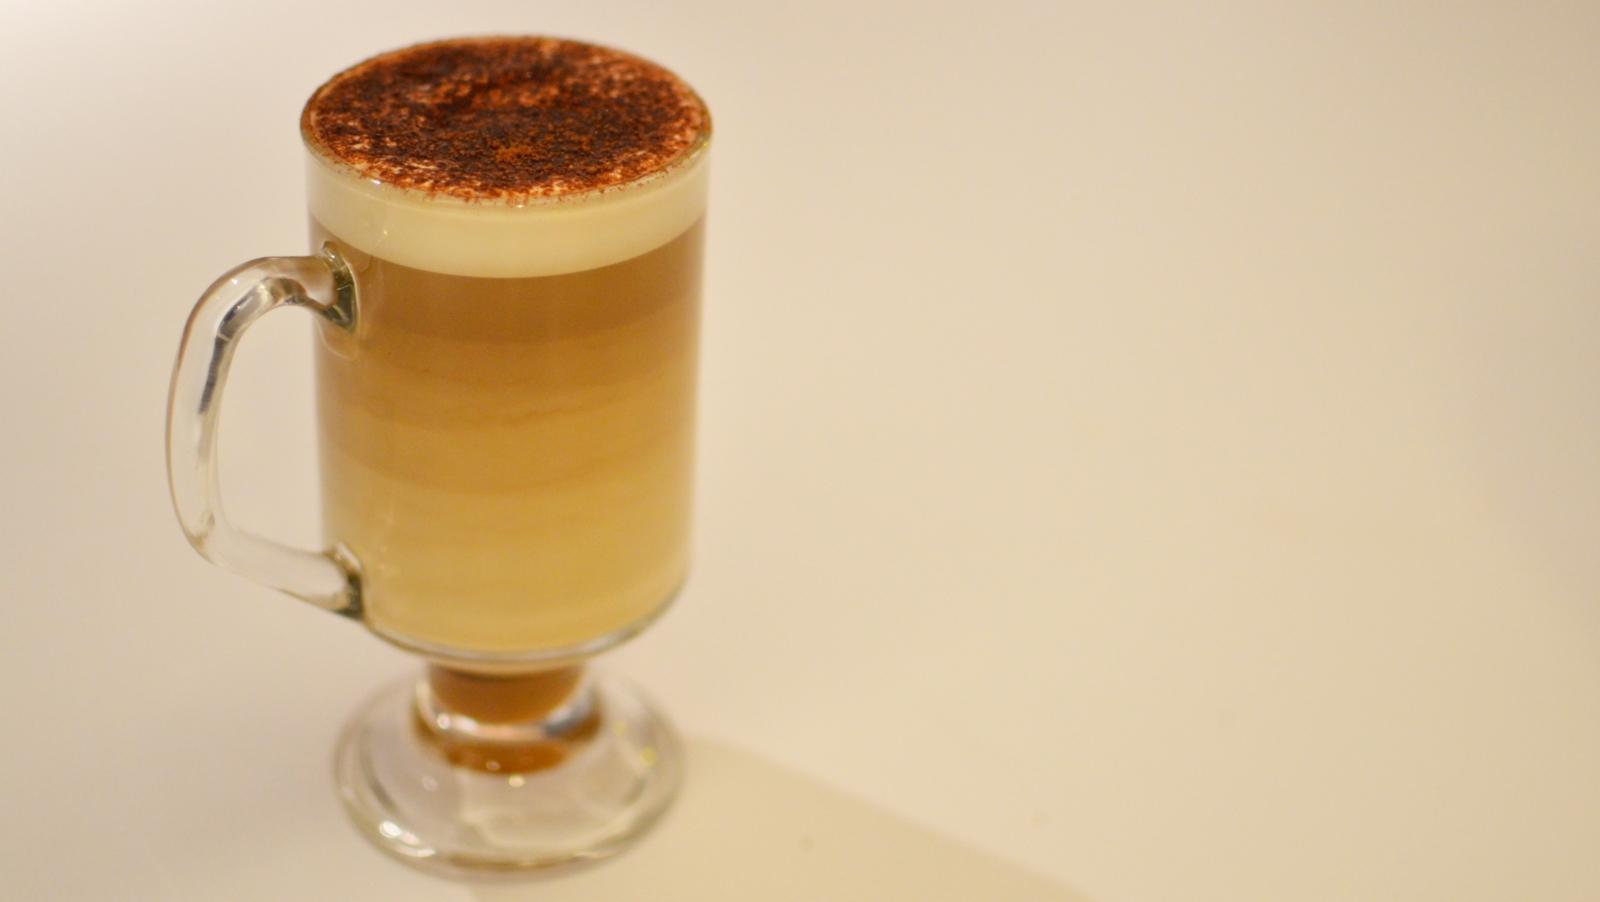 macdonald's 麥當勞 制服 裝修 mccafe Tiramisu latte 鮮奶咖啡 咖啡朱古力蛋糕 核桃咖啡林明頓蛋糕 lamington